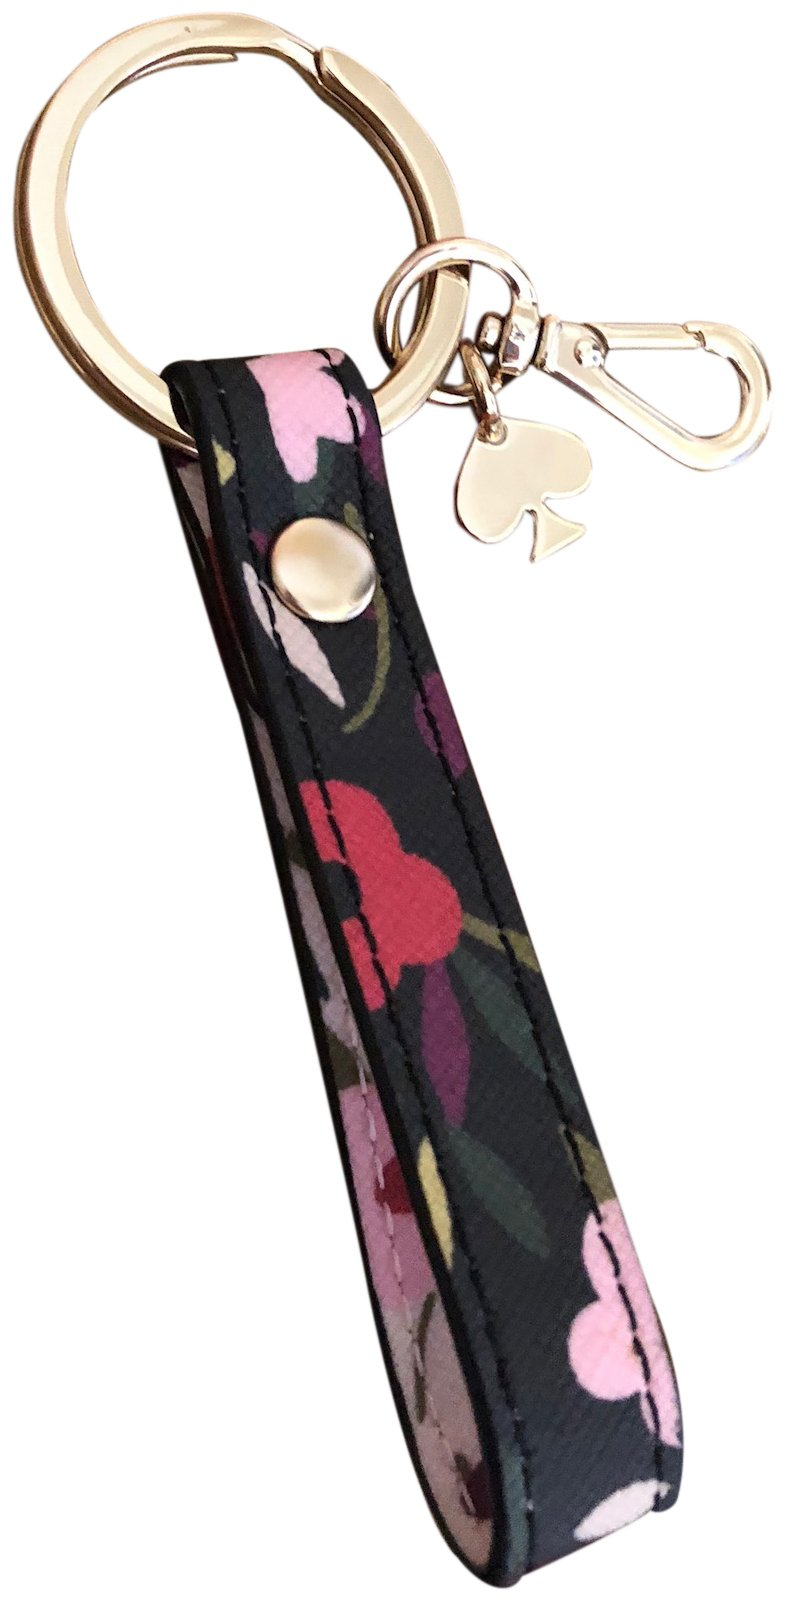 Kate Spade New York Saffiano Leather Strap Key Chain Ring Key Fob Black Multi